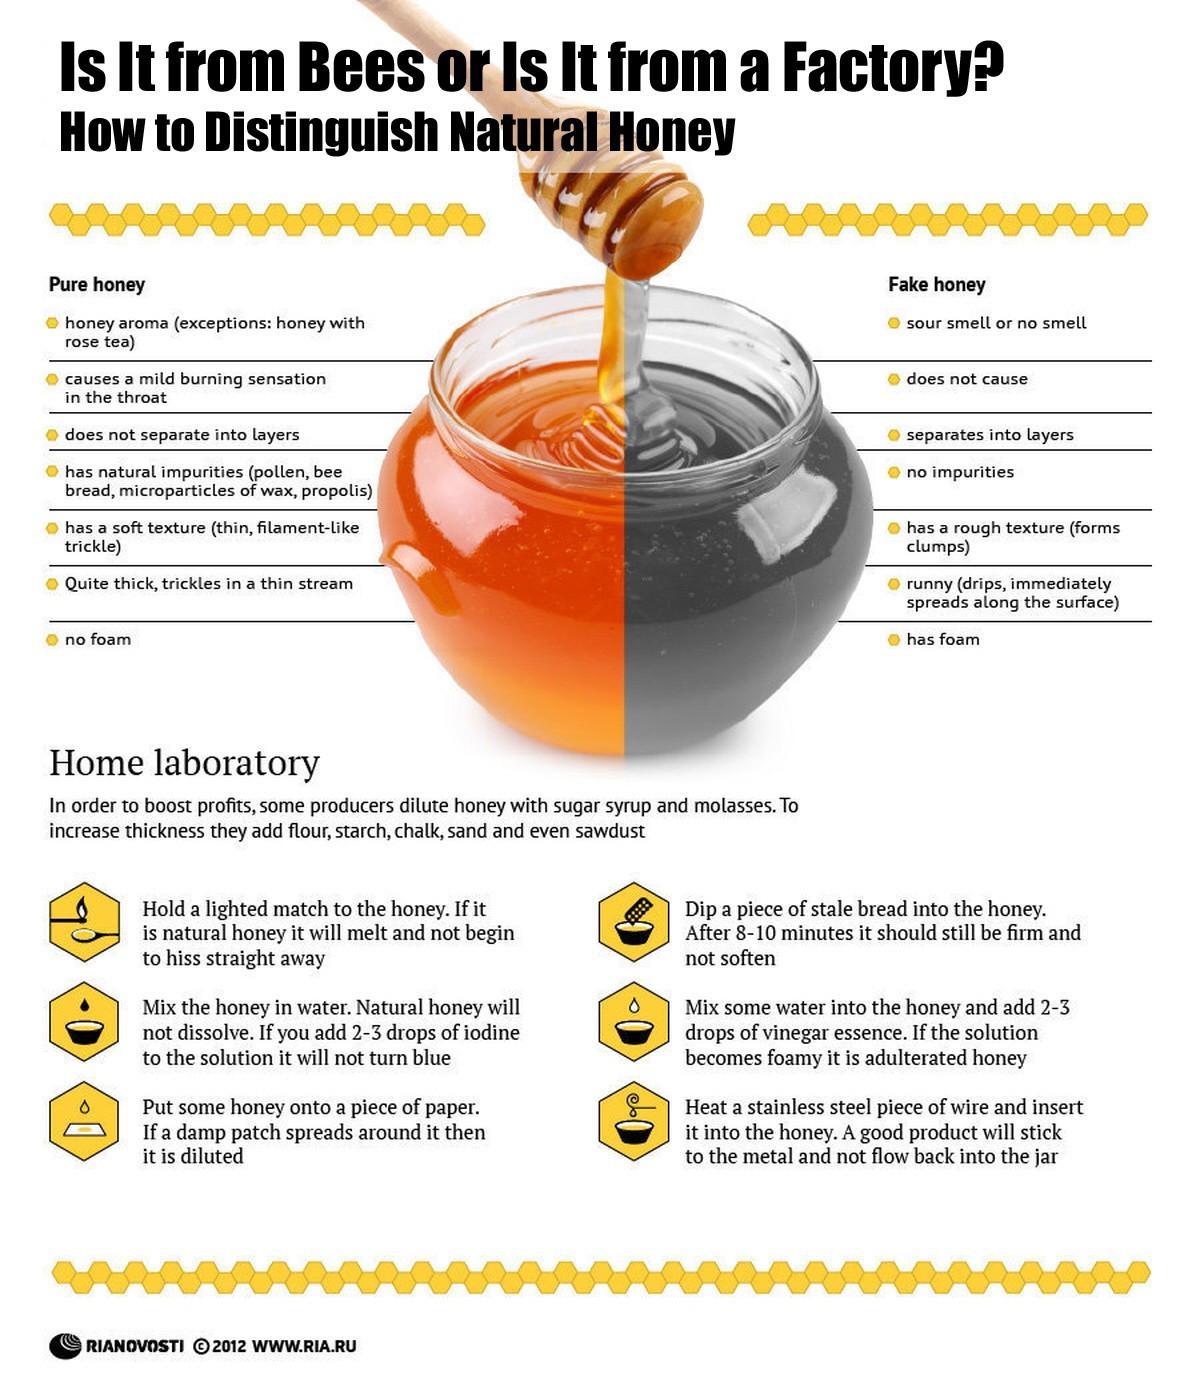 Real Honey Vs. Factory Honey